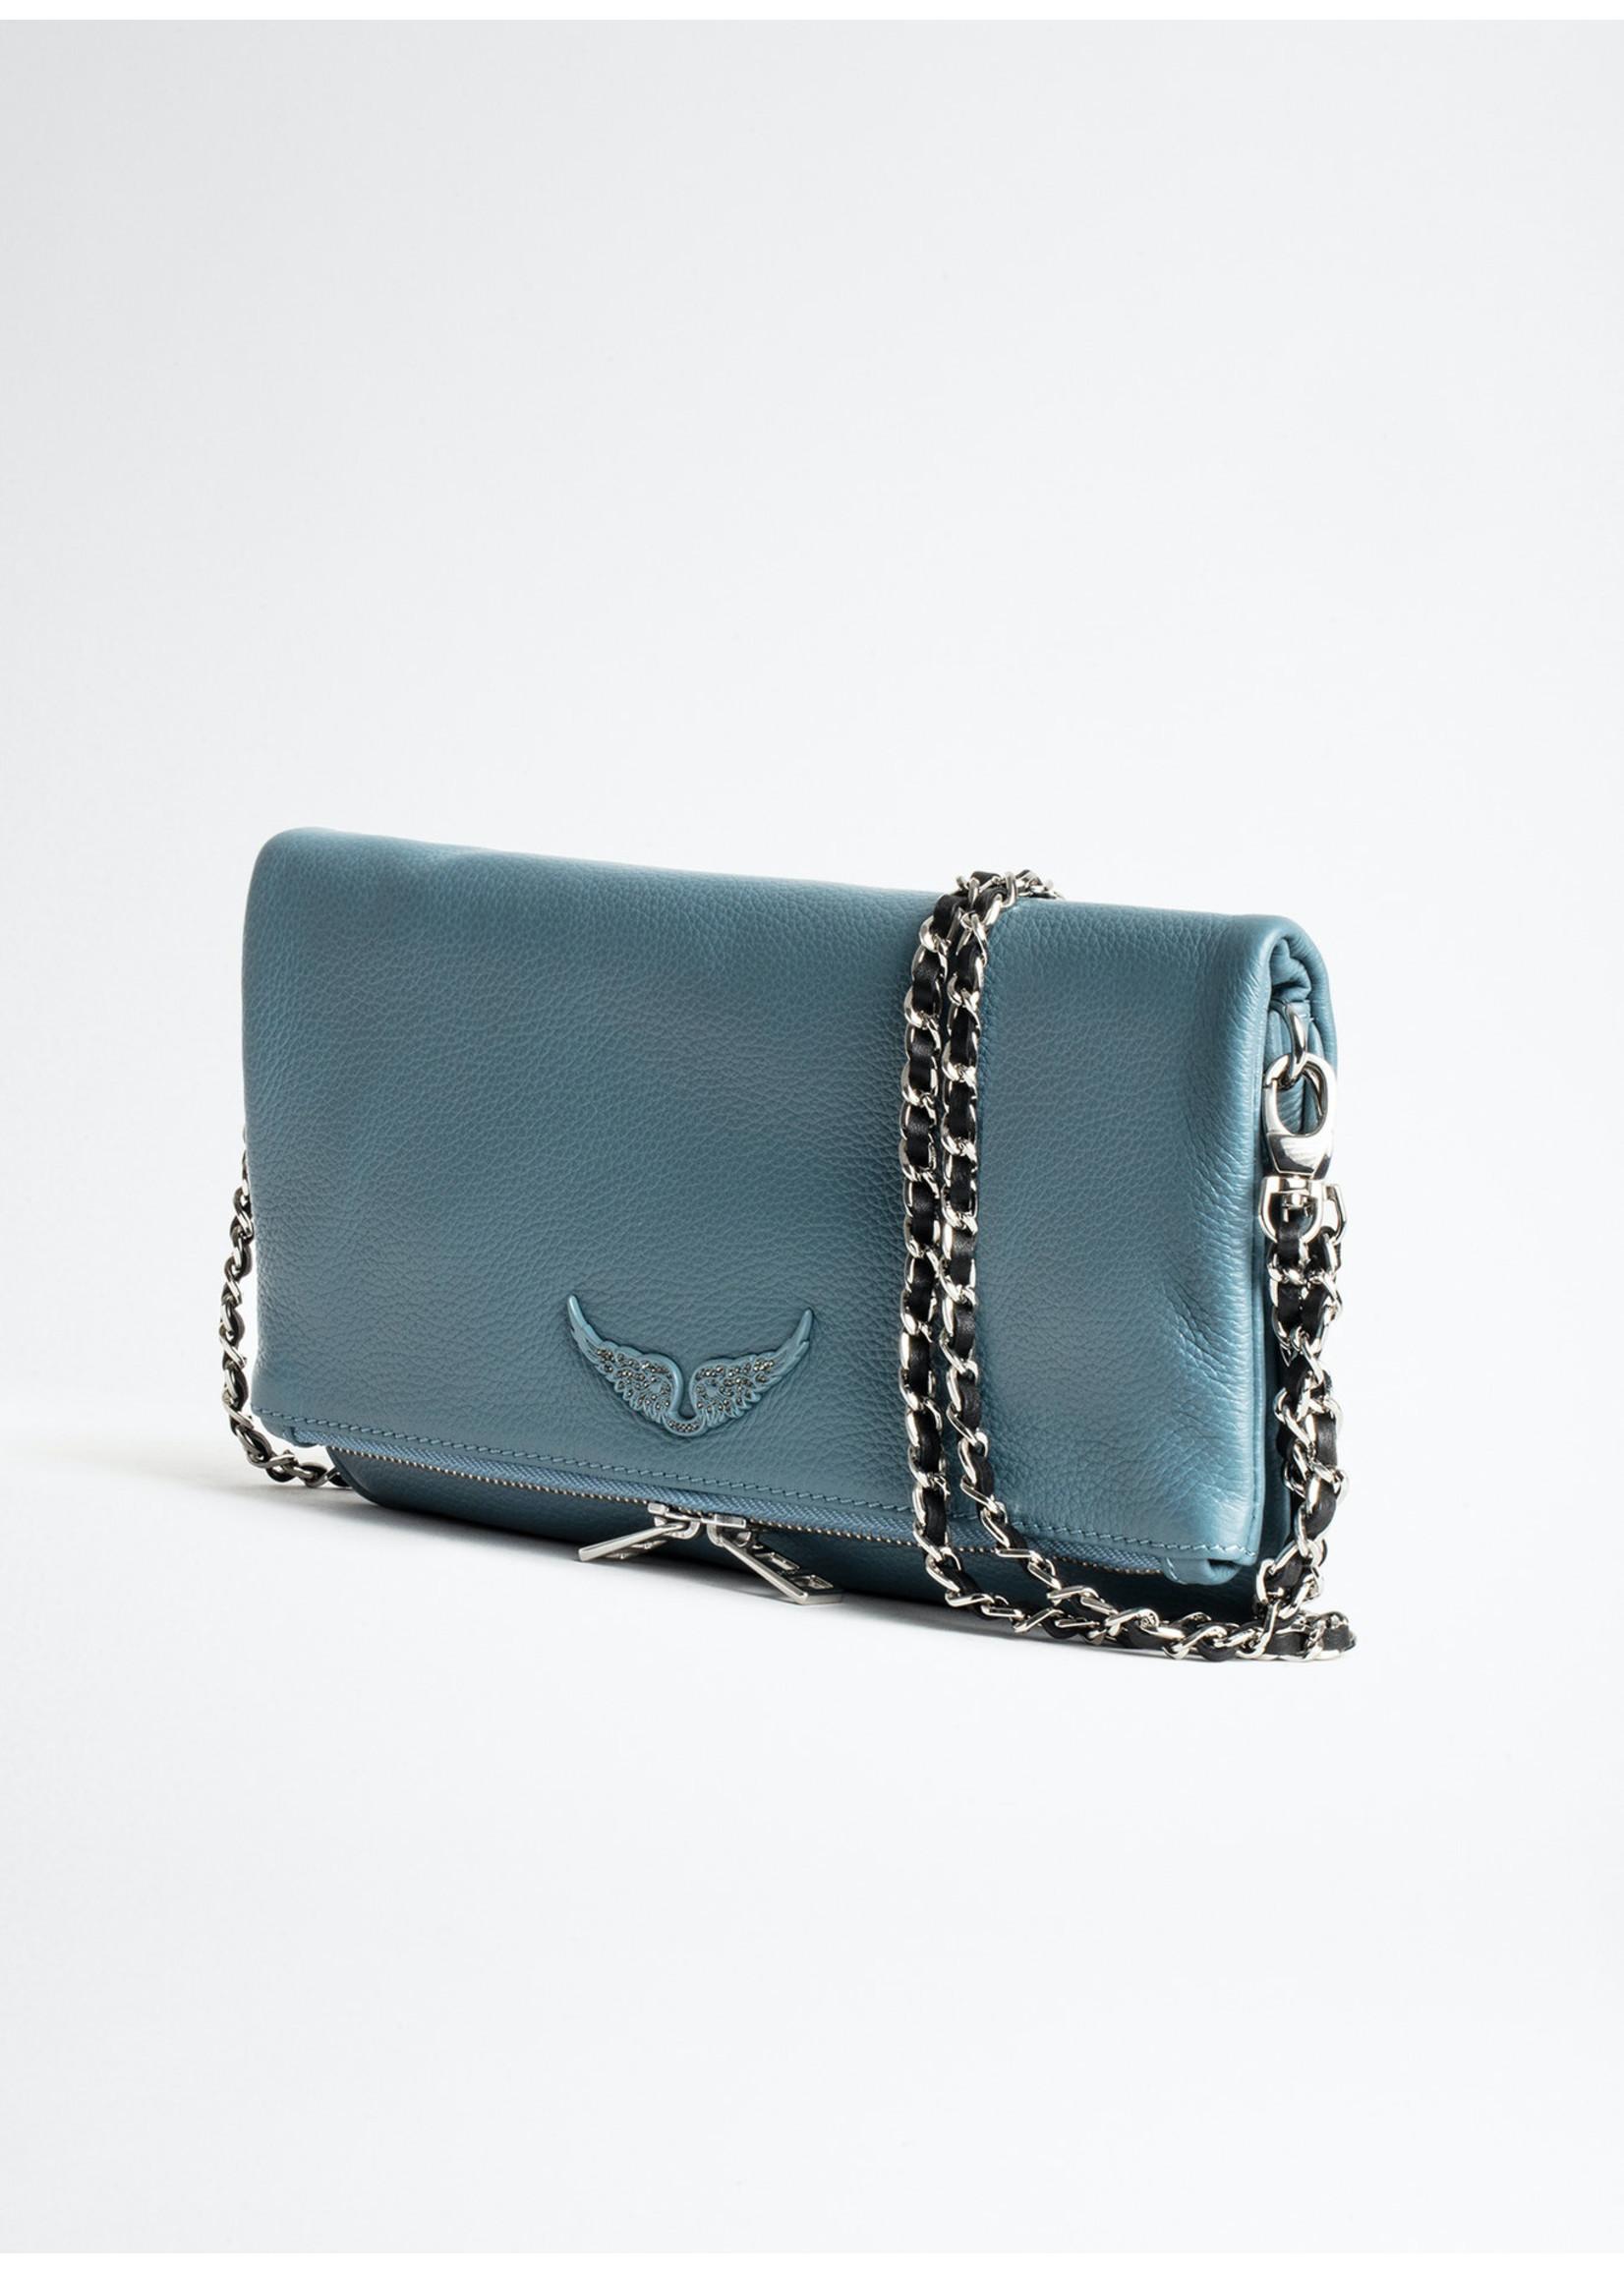 Zadig & Voltaire Rock grained le blue